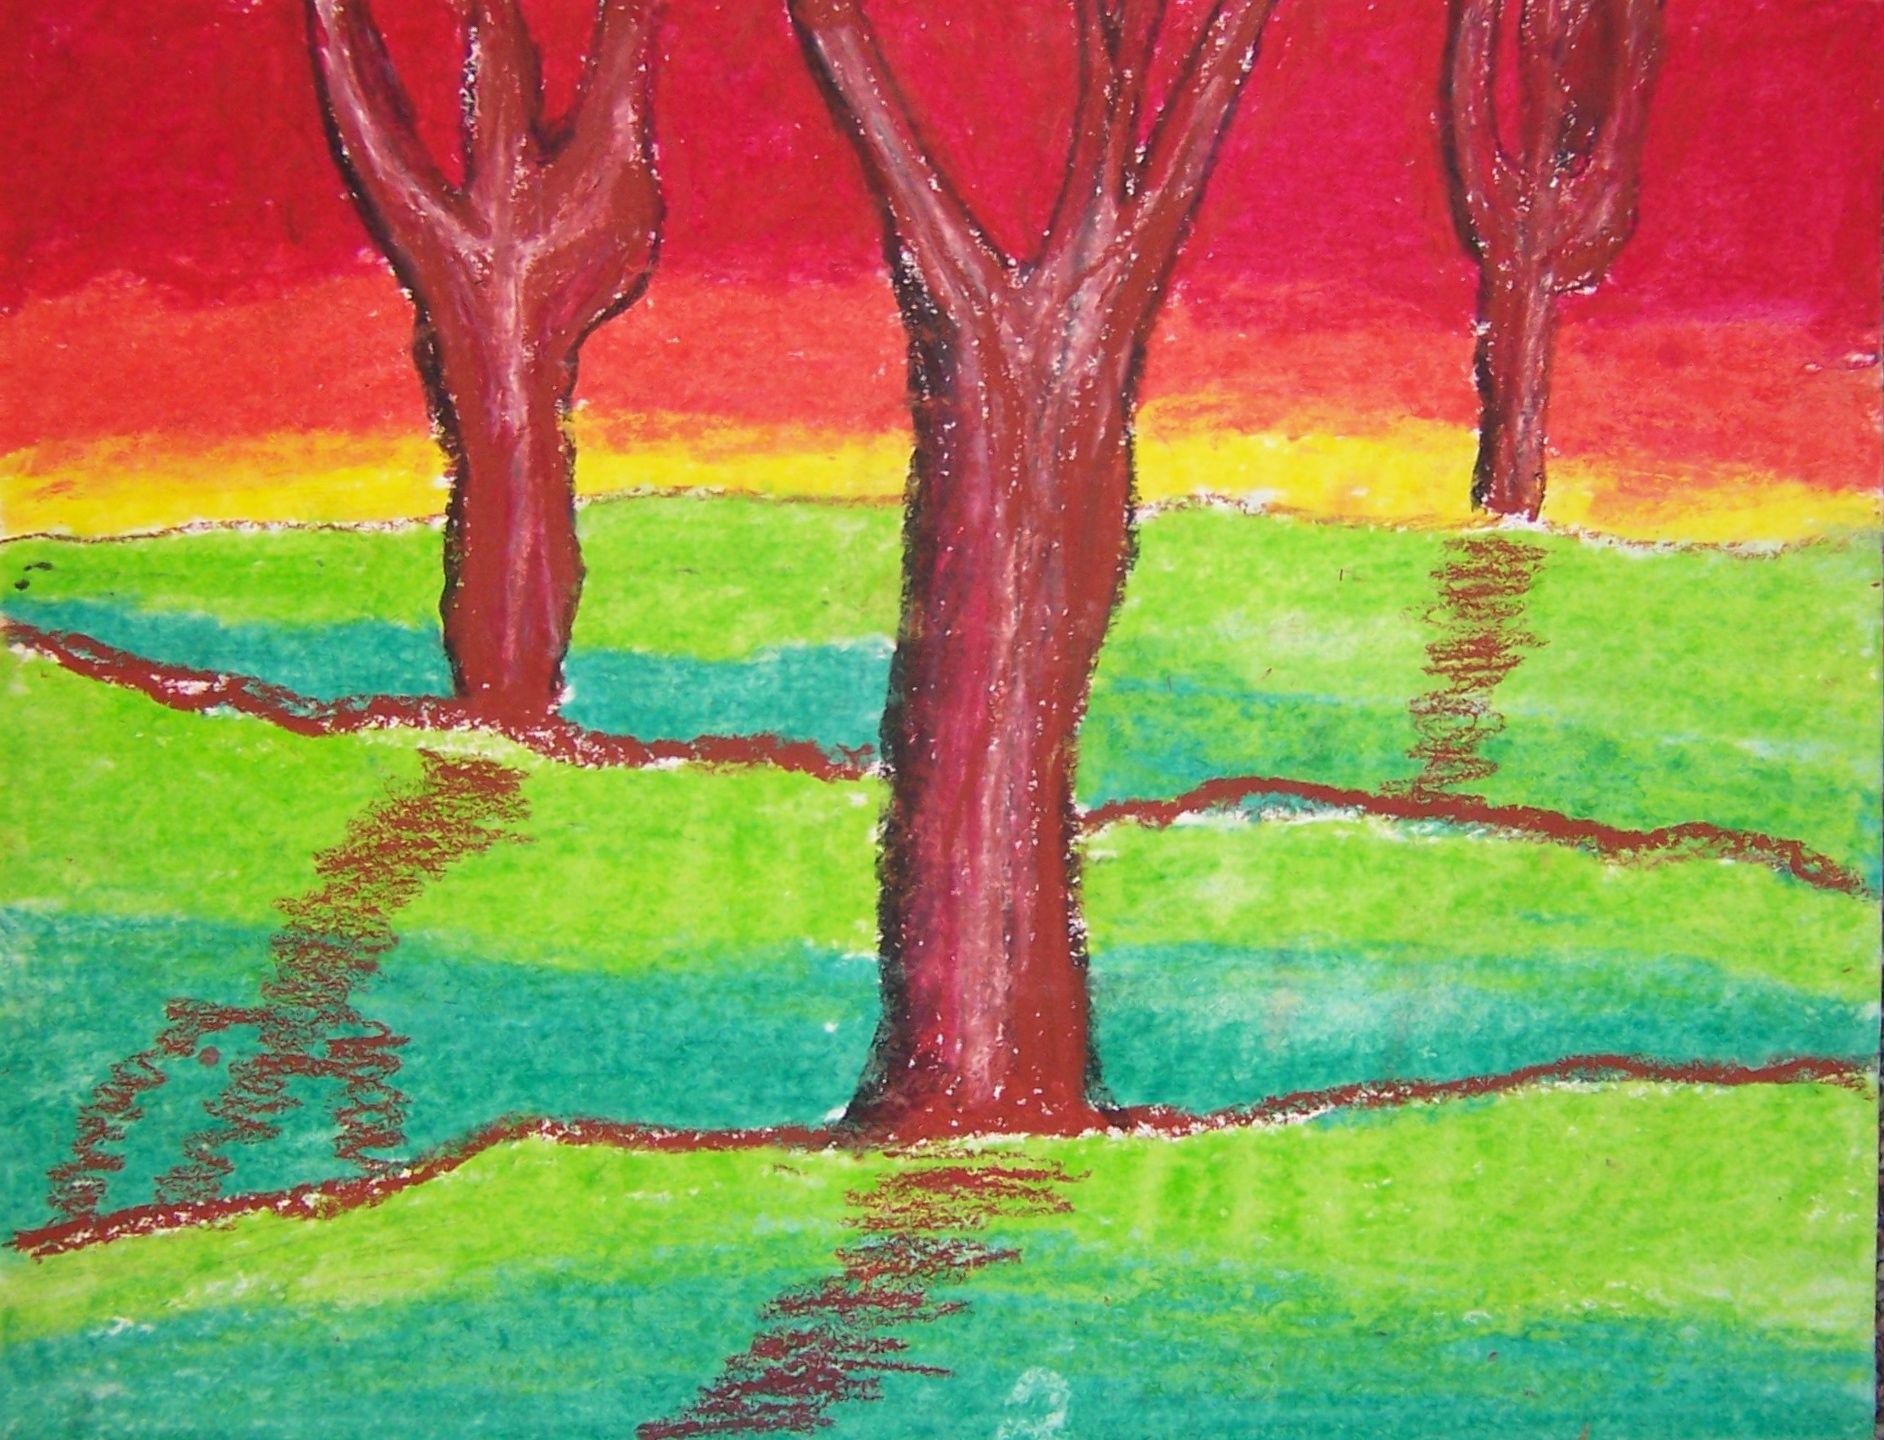 cool colors | Wilder Paint Splatters